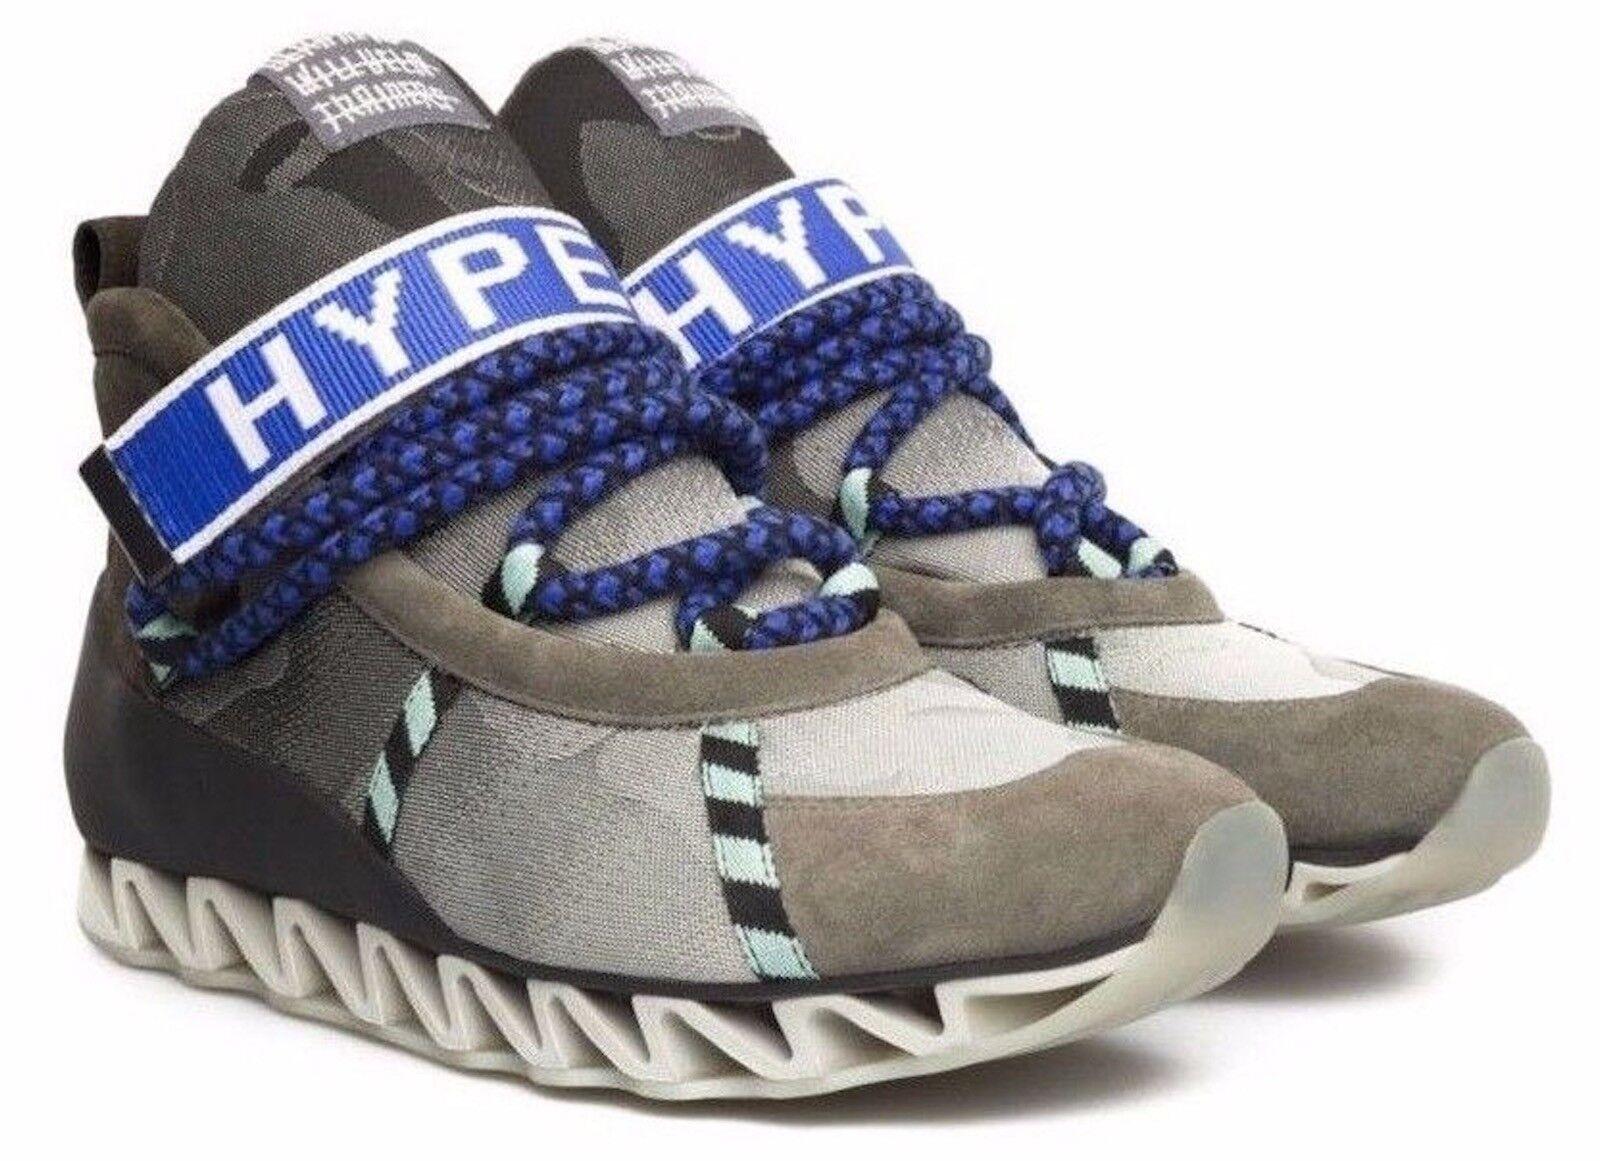 Bernhard Willhelm X Camper US 11 EU 44 Together Himalayan Sneakers 36514-026